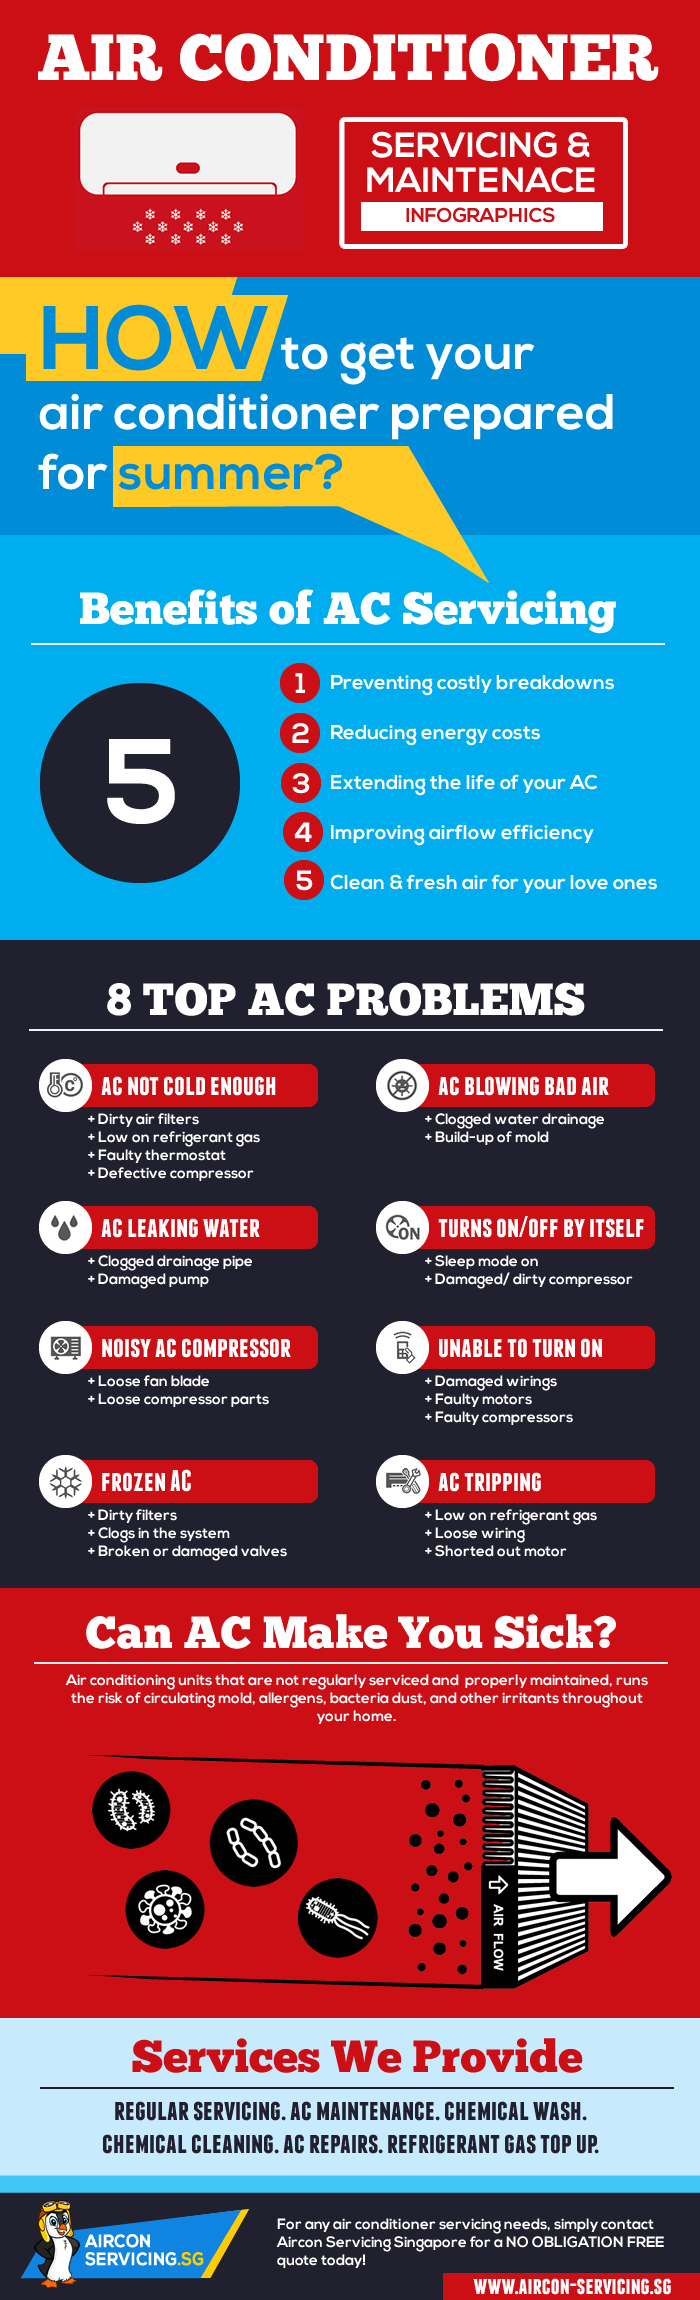 Air Conditioner Servicing & Maintenance 101